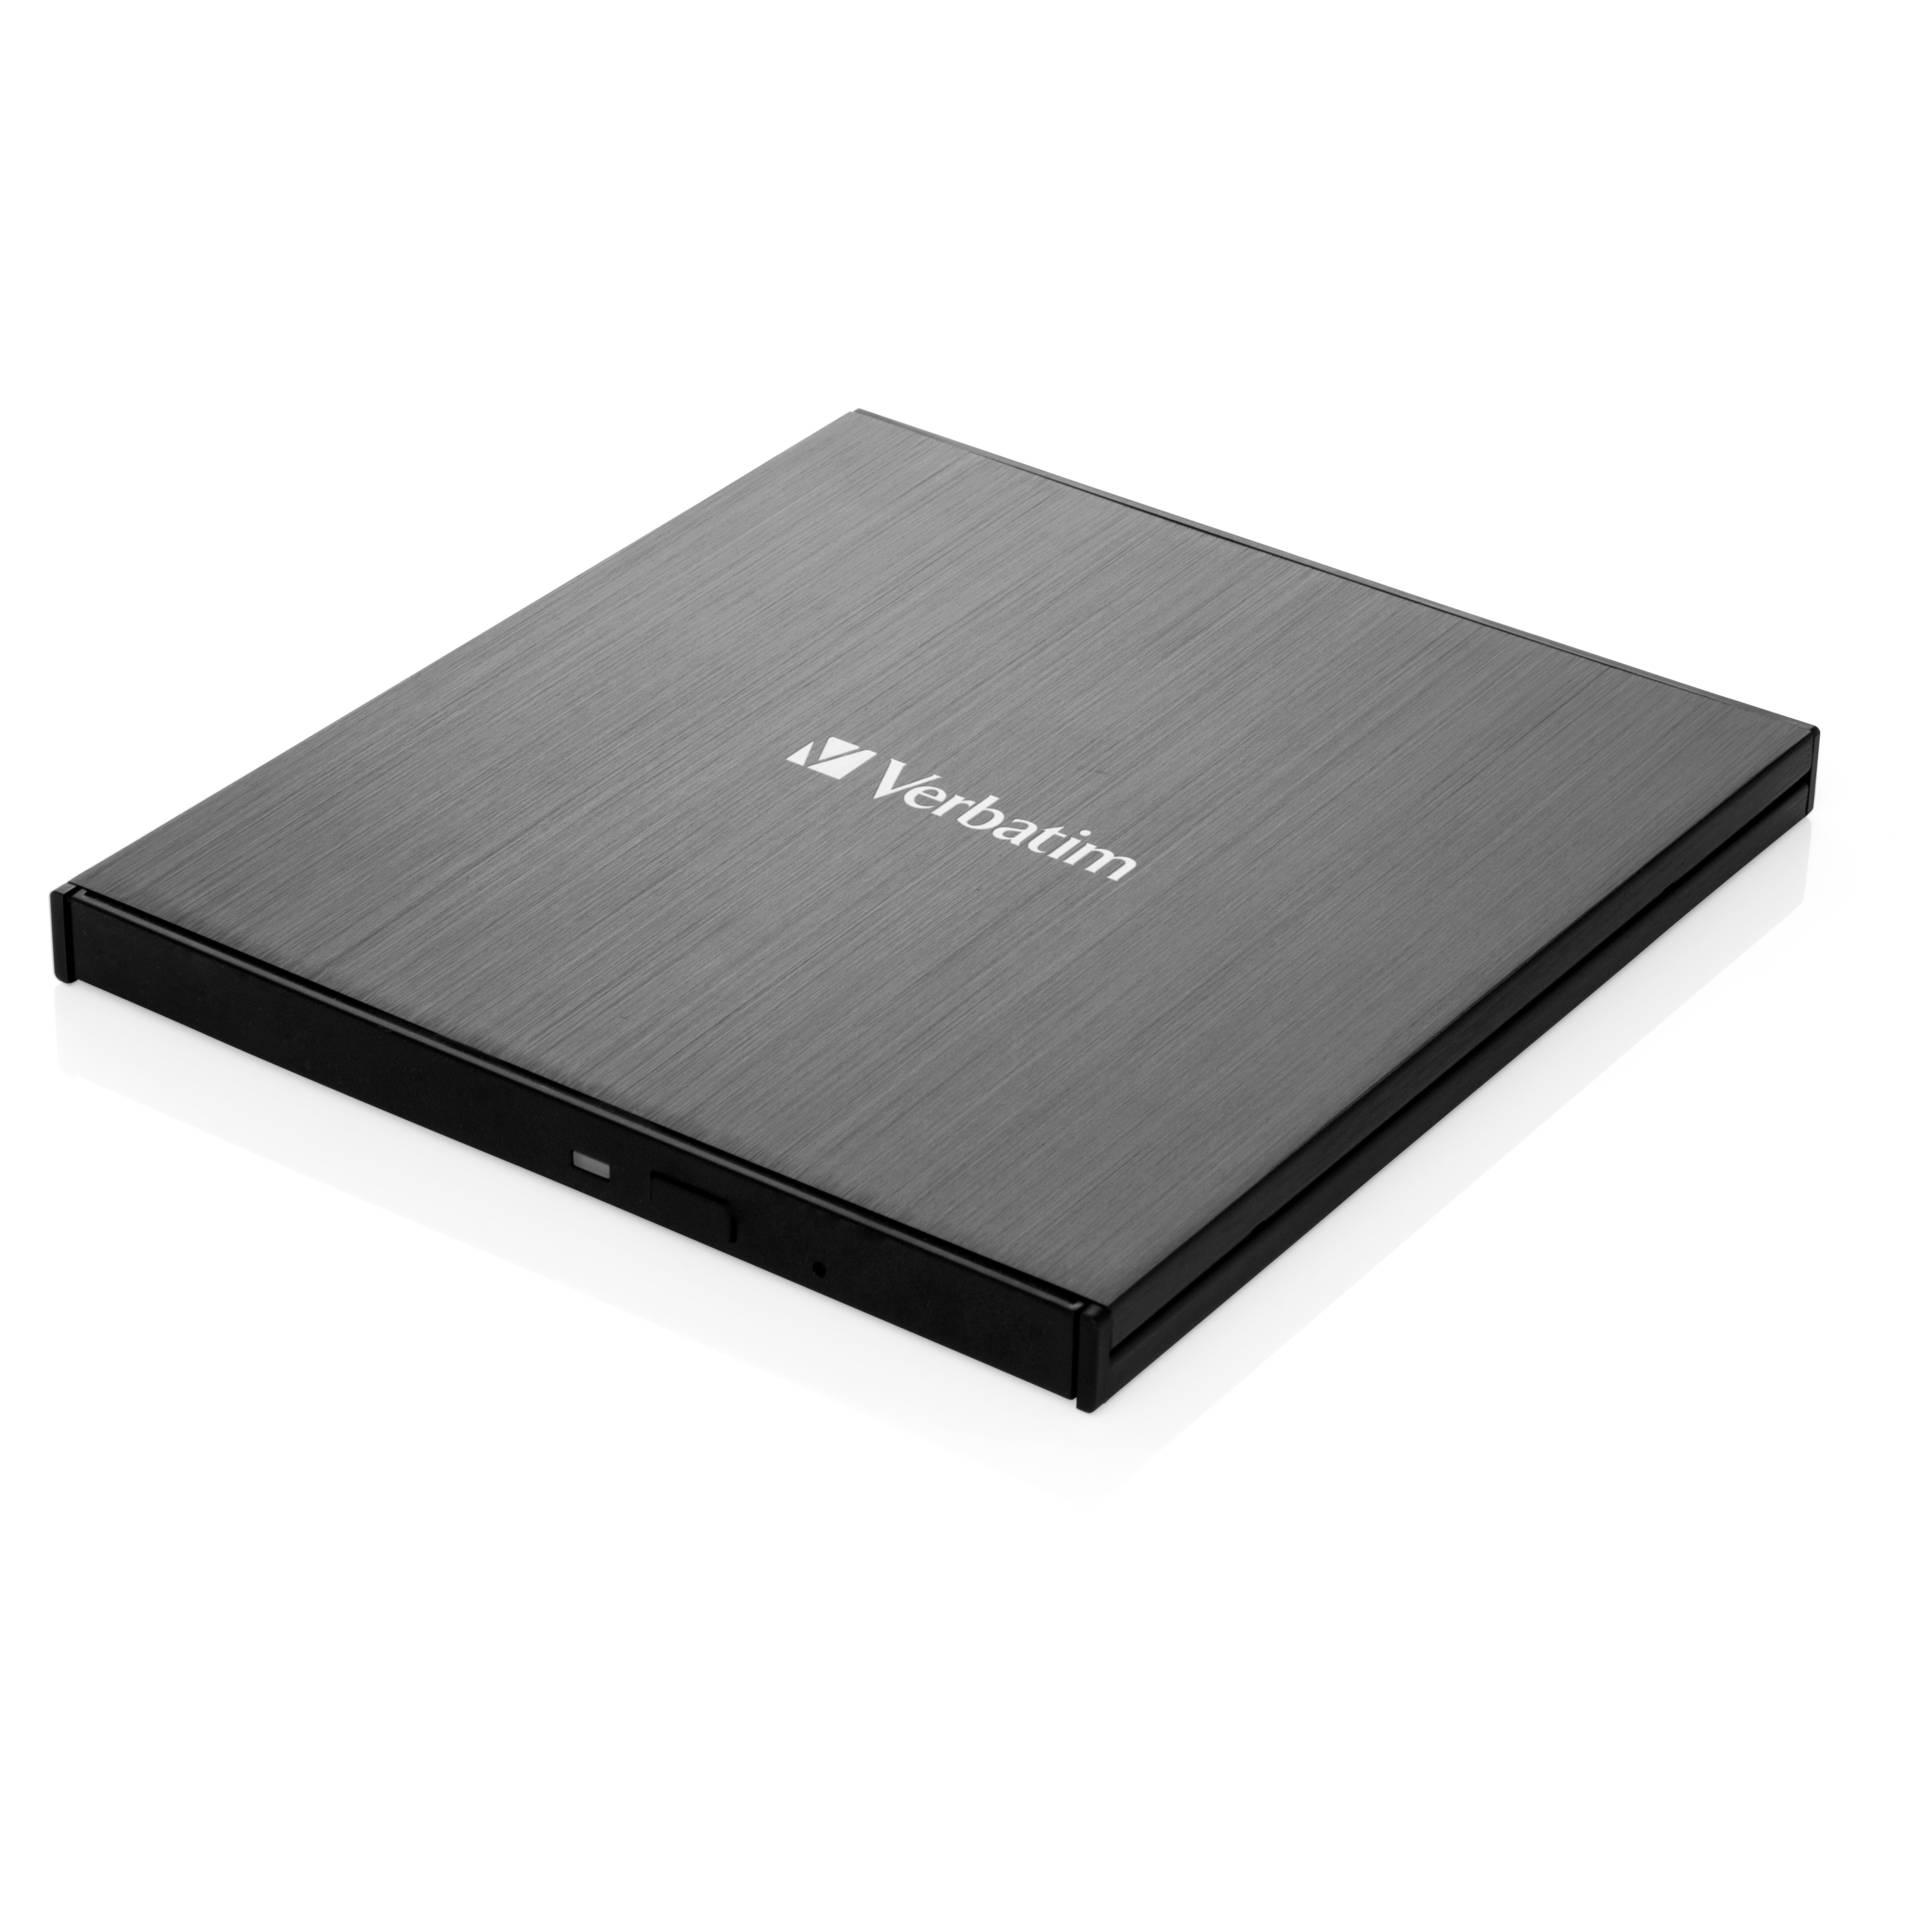 Verbatim Slimline CD / DVD ReWriter USB-C